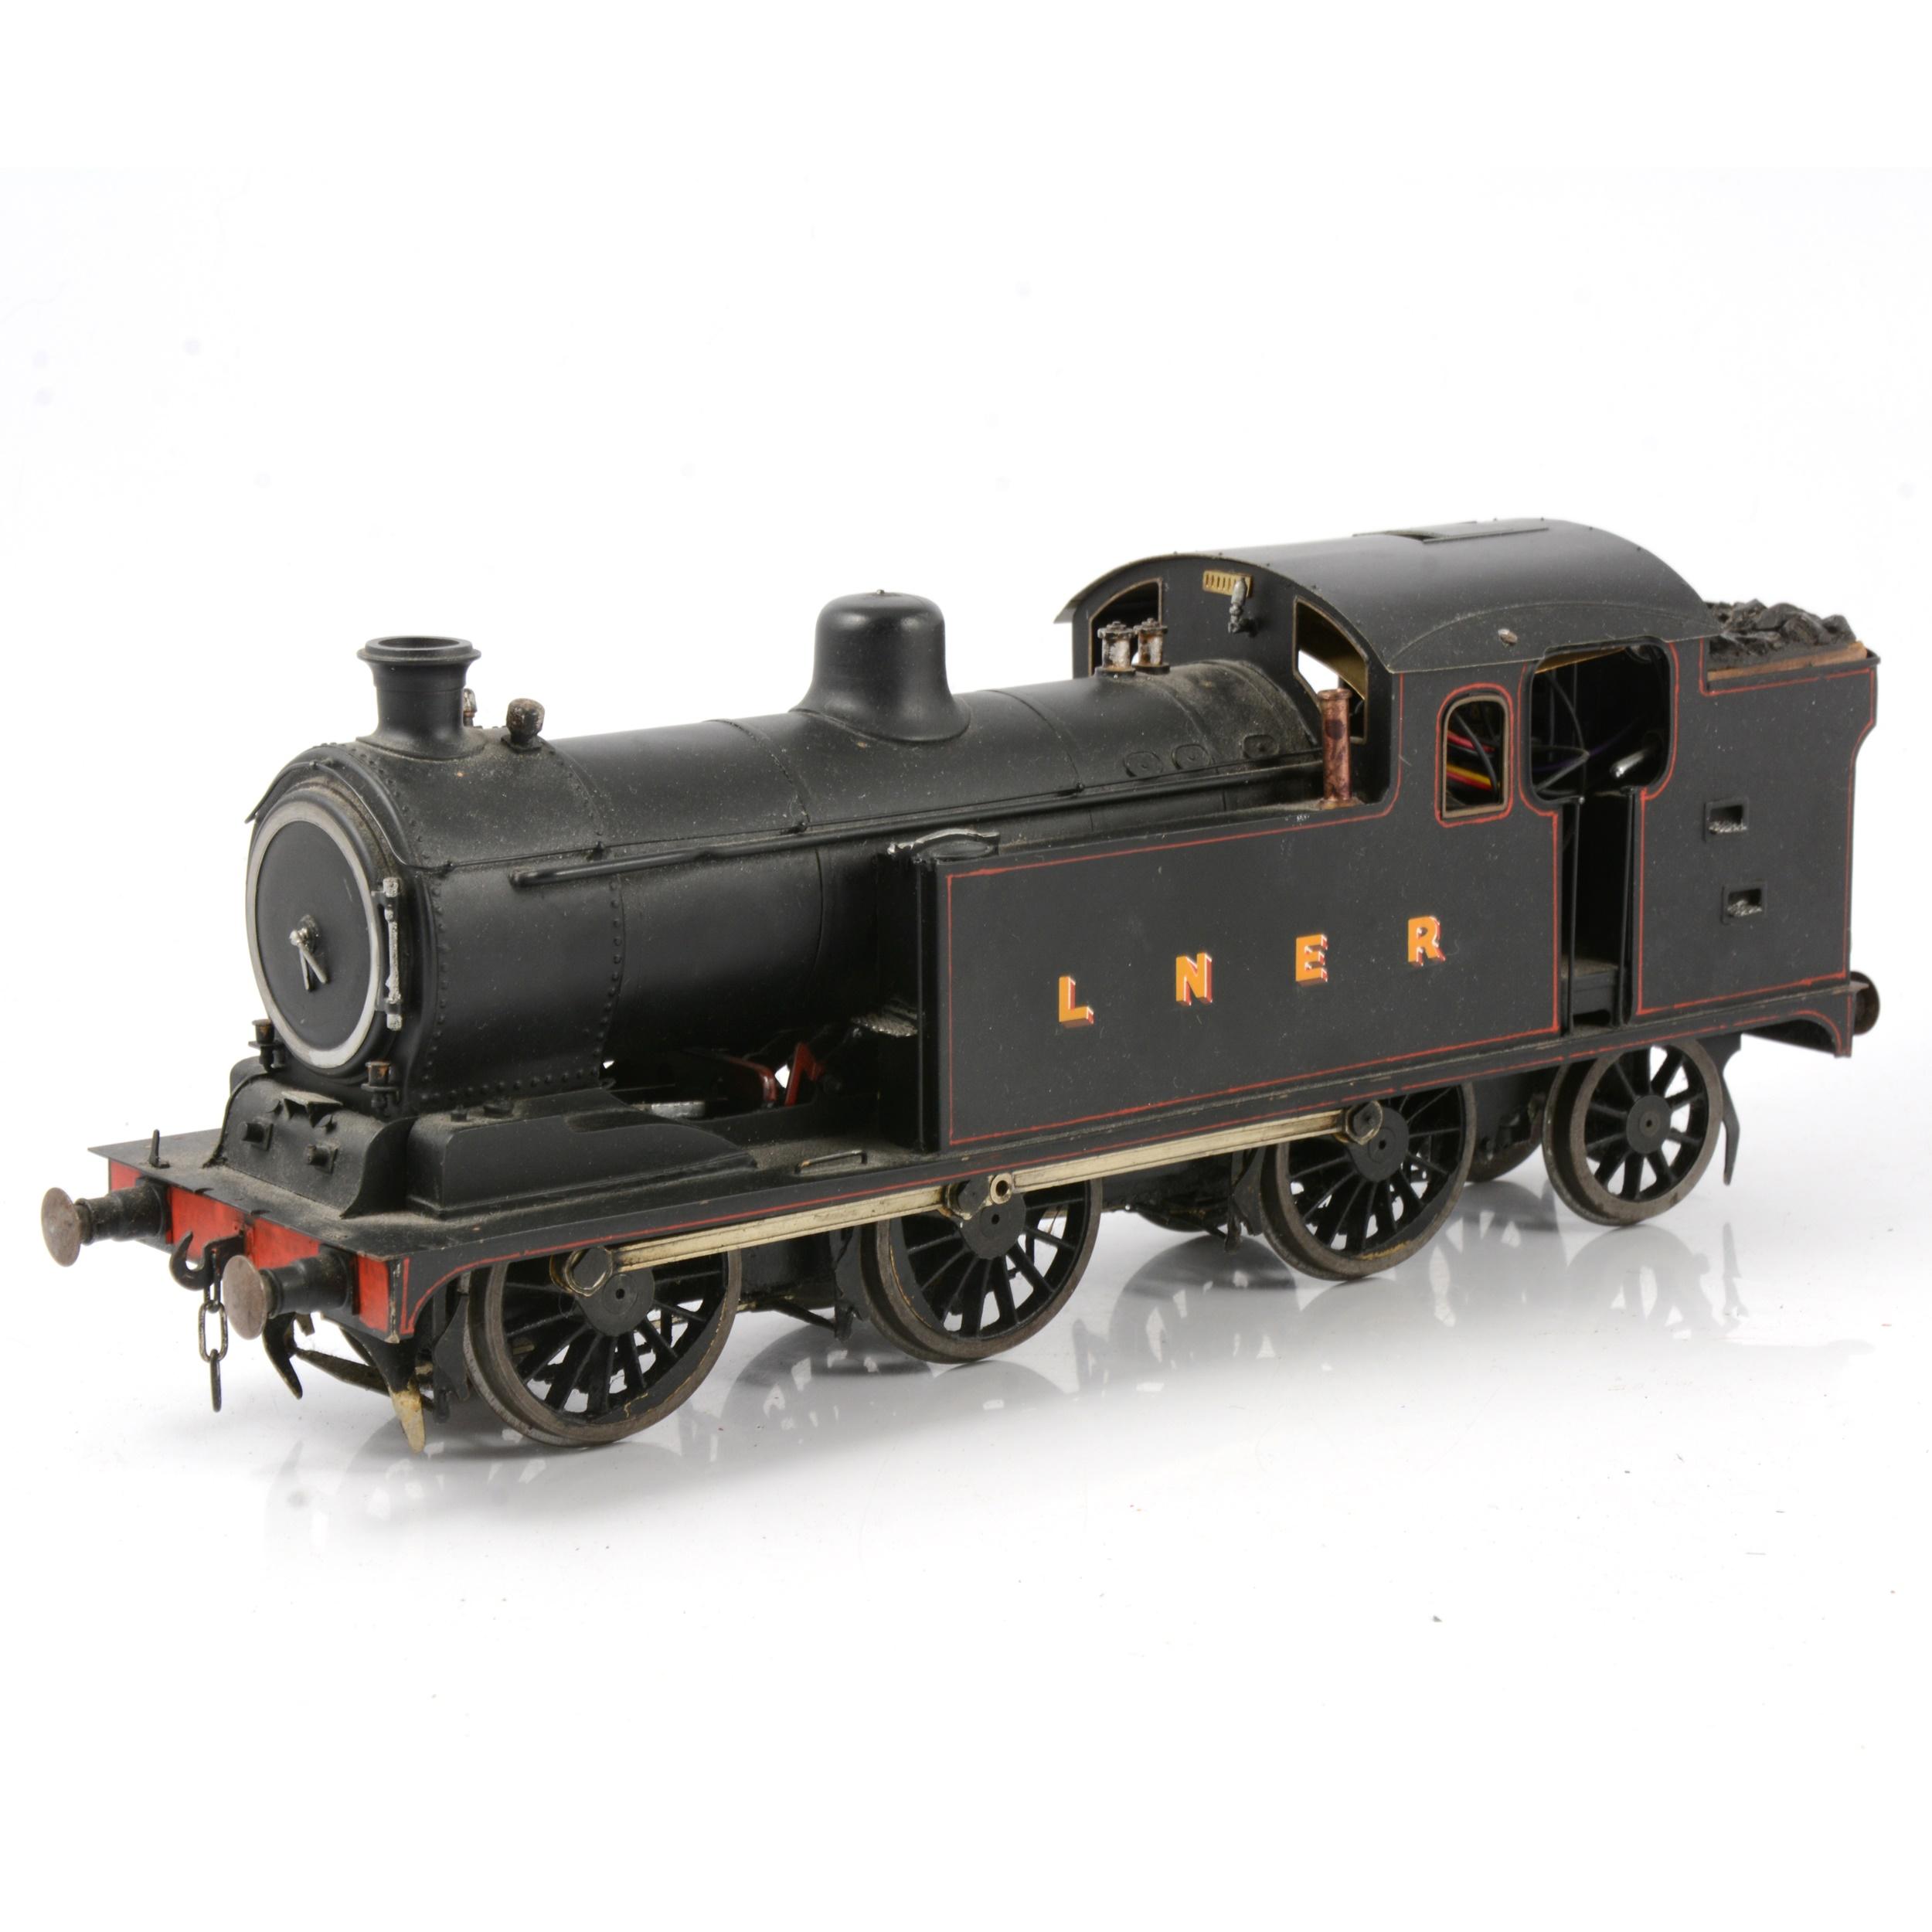 A well-built electric gauge 1 / G scale, 45mm locomotive, LNER 0-6-2 tank engine